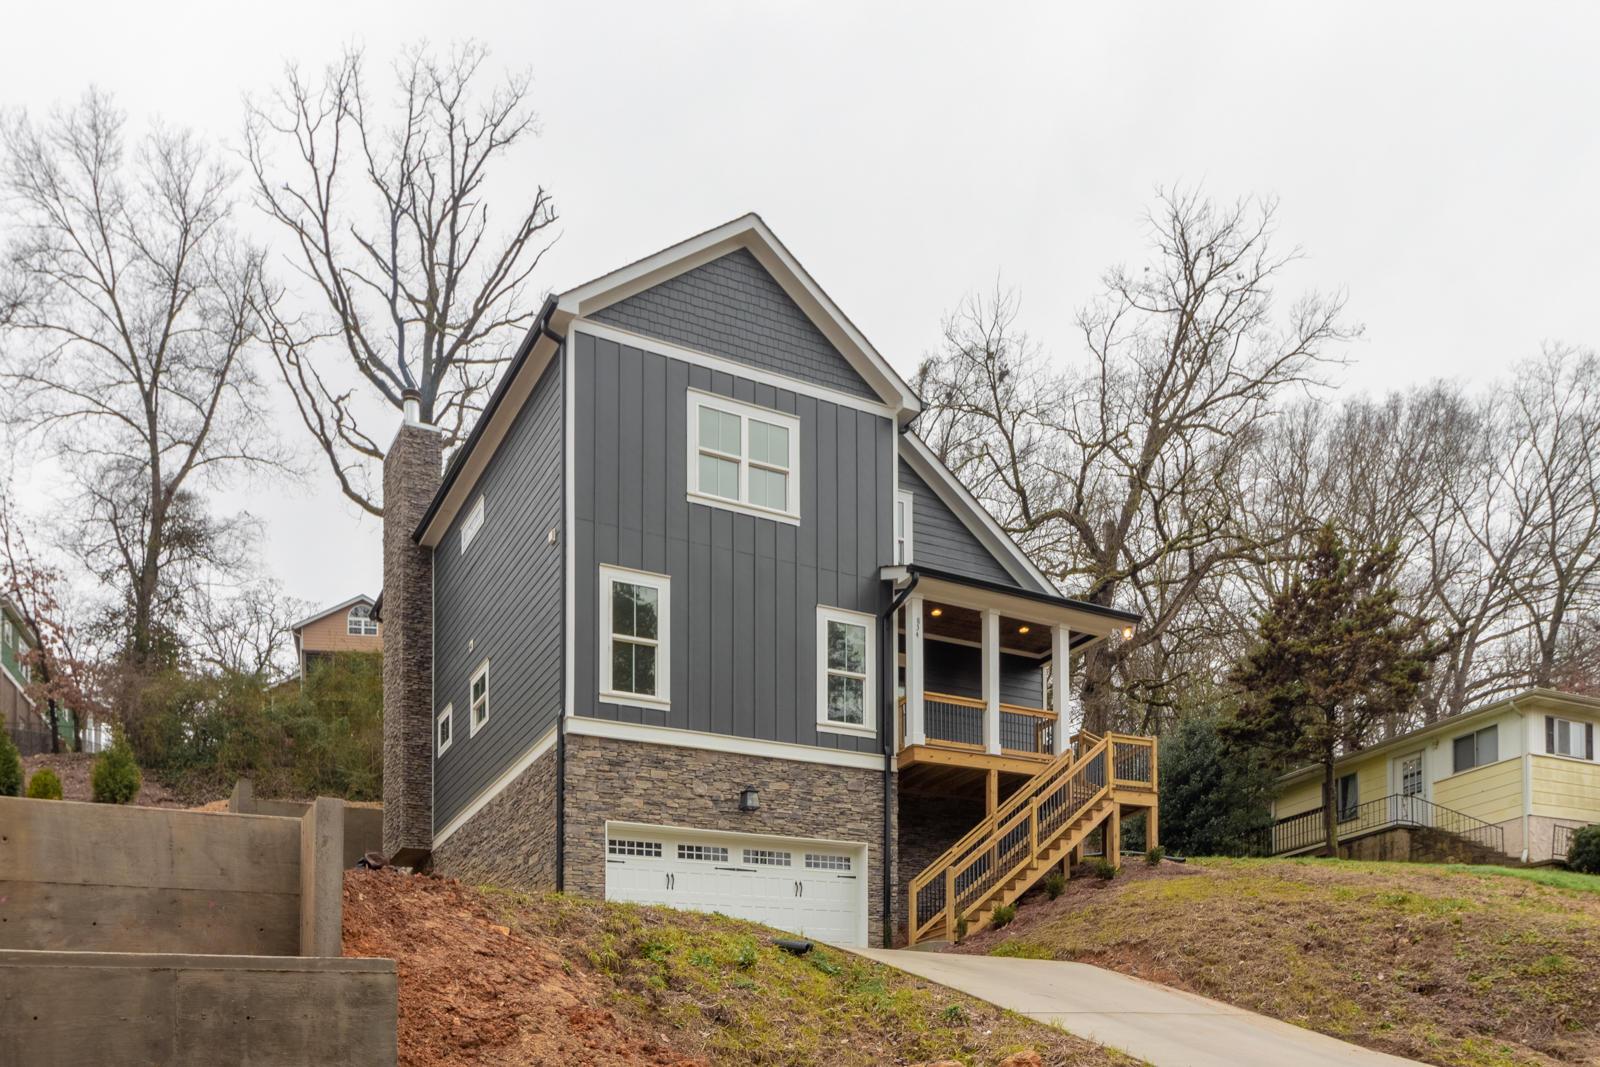 834 Dartmouth St, Chattanooga, TN 37405